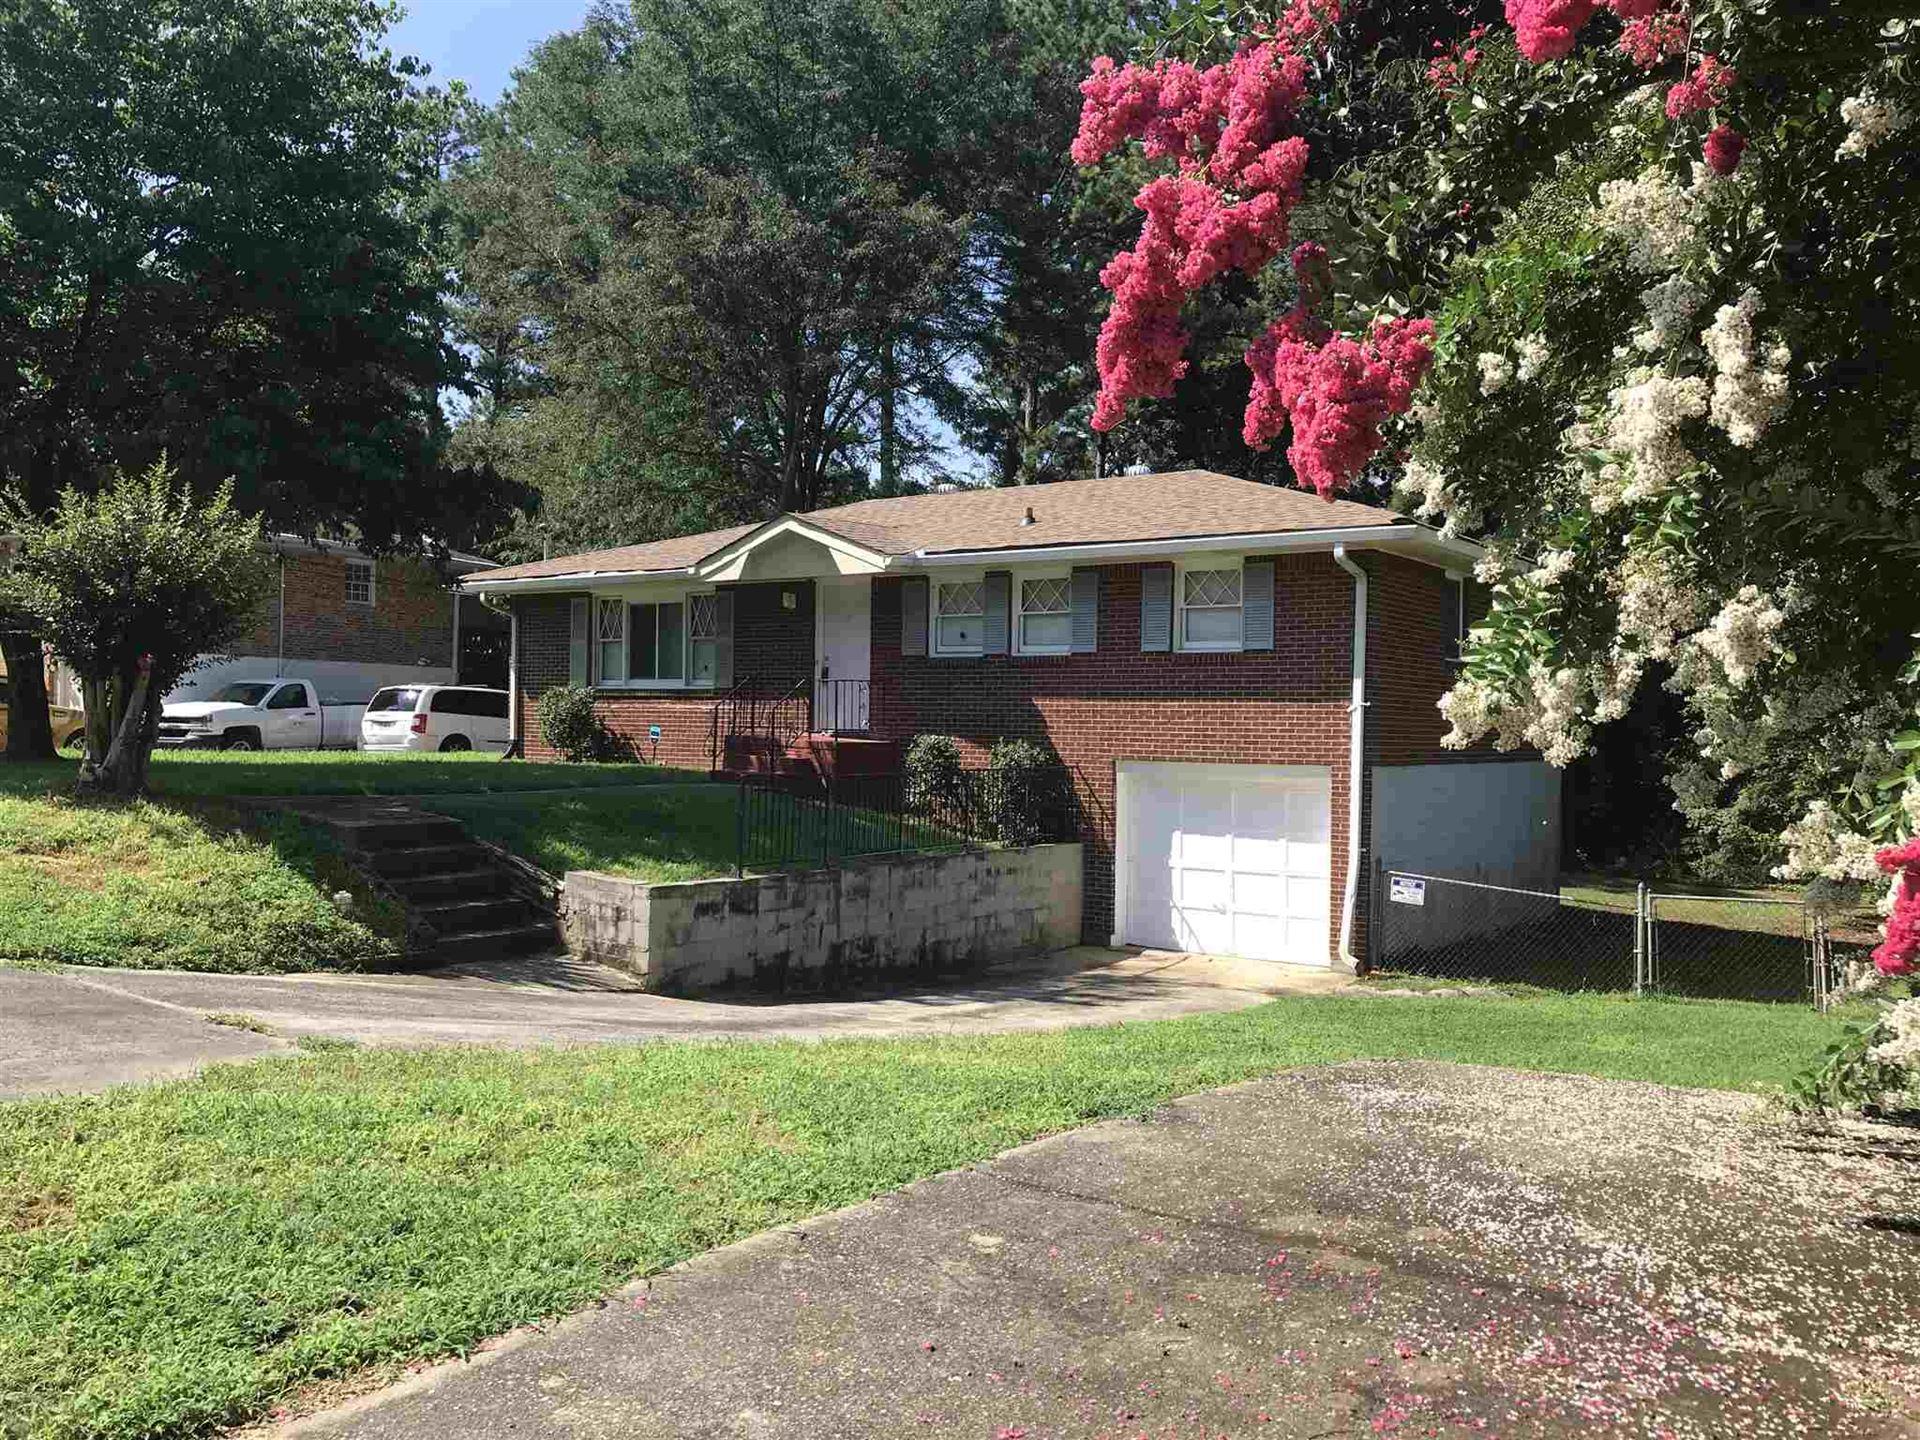 919 Boca Raton Dr, Forest Park, GA 30297 - #: 8799901